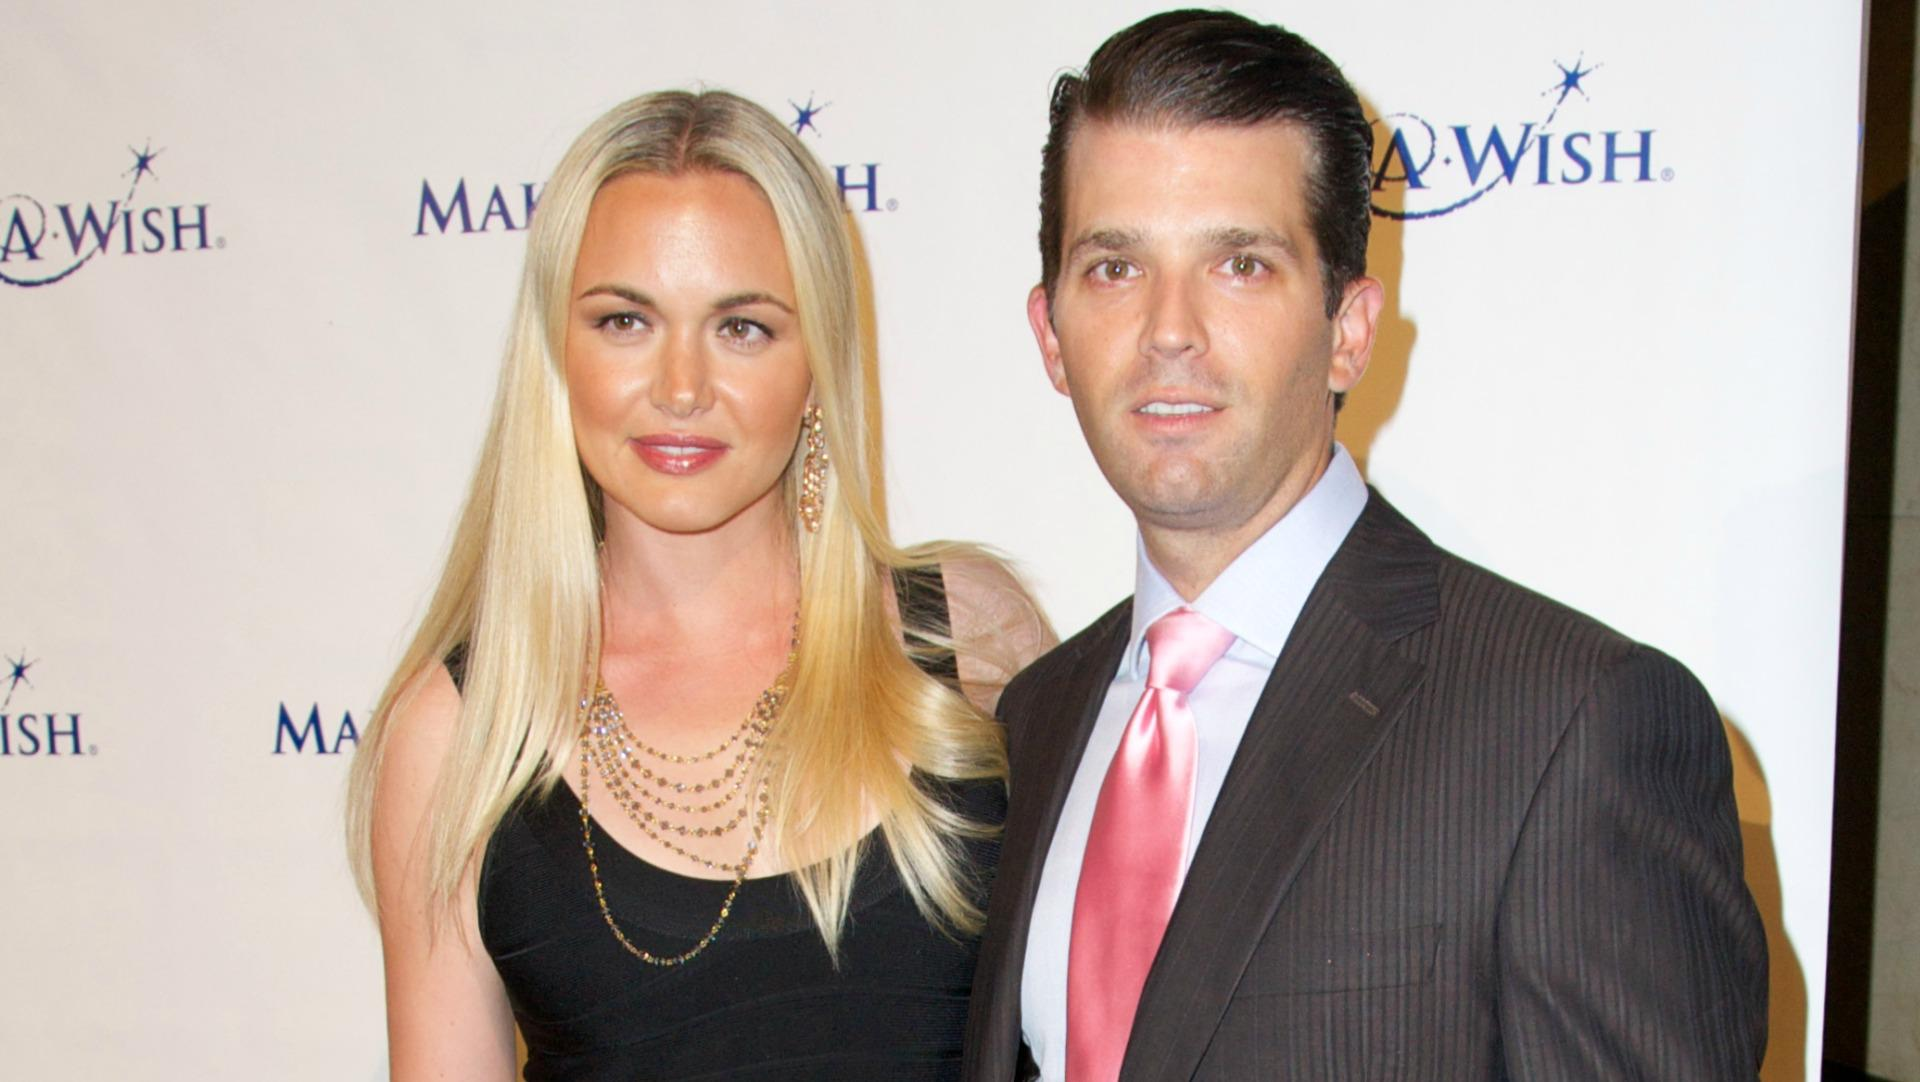 Es oficial: Vanessa Trump pide el divorcio a Donald Trump Jr